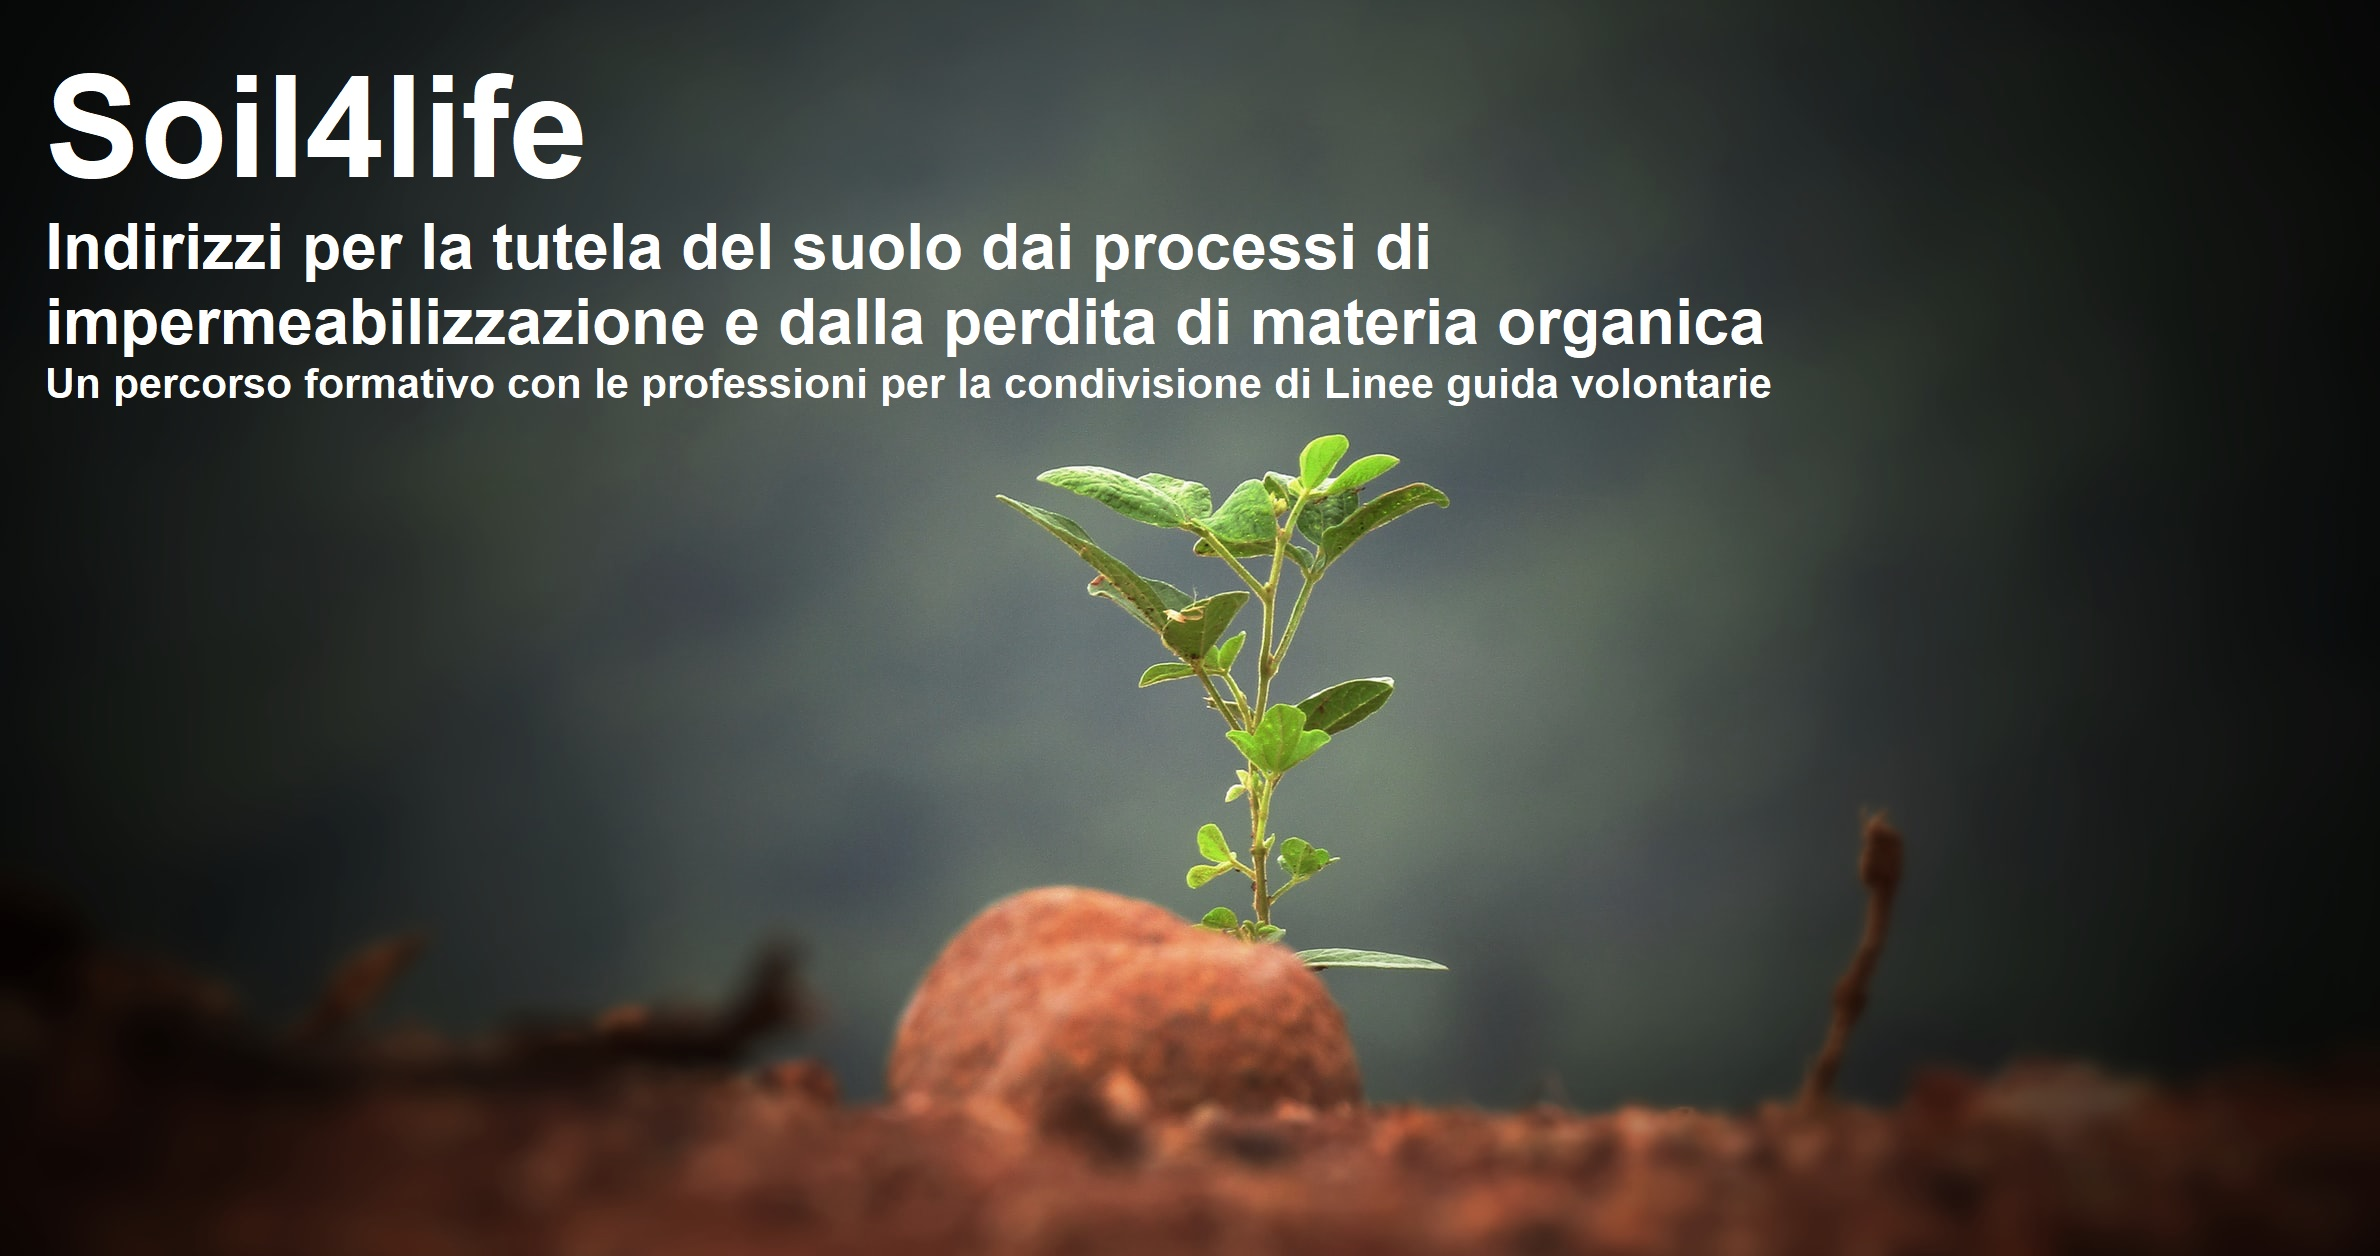 Soil4life